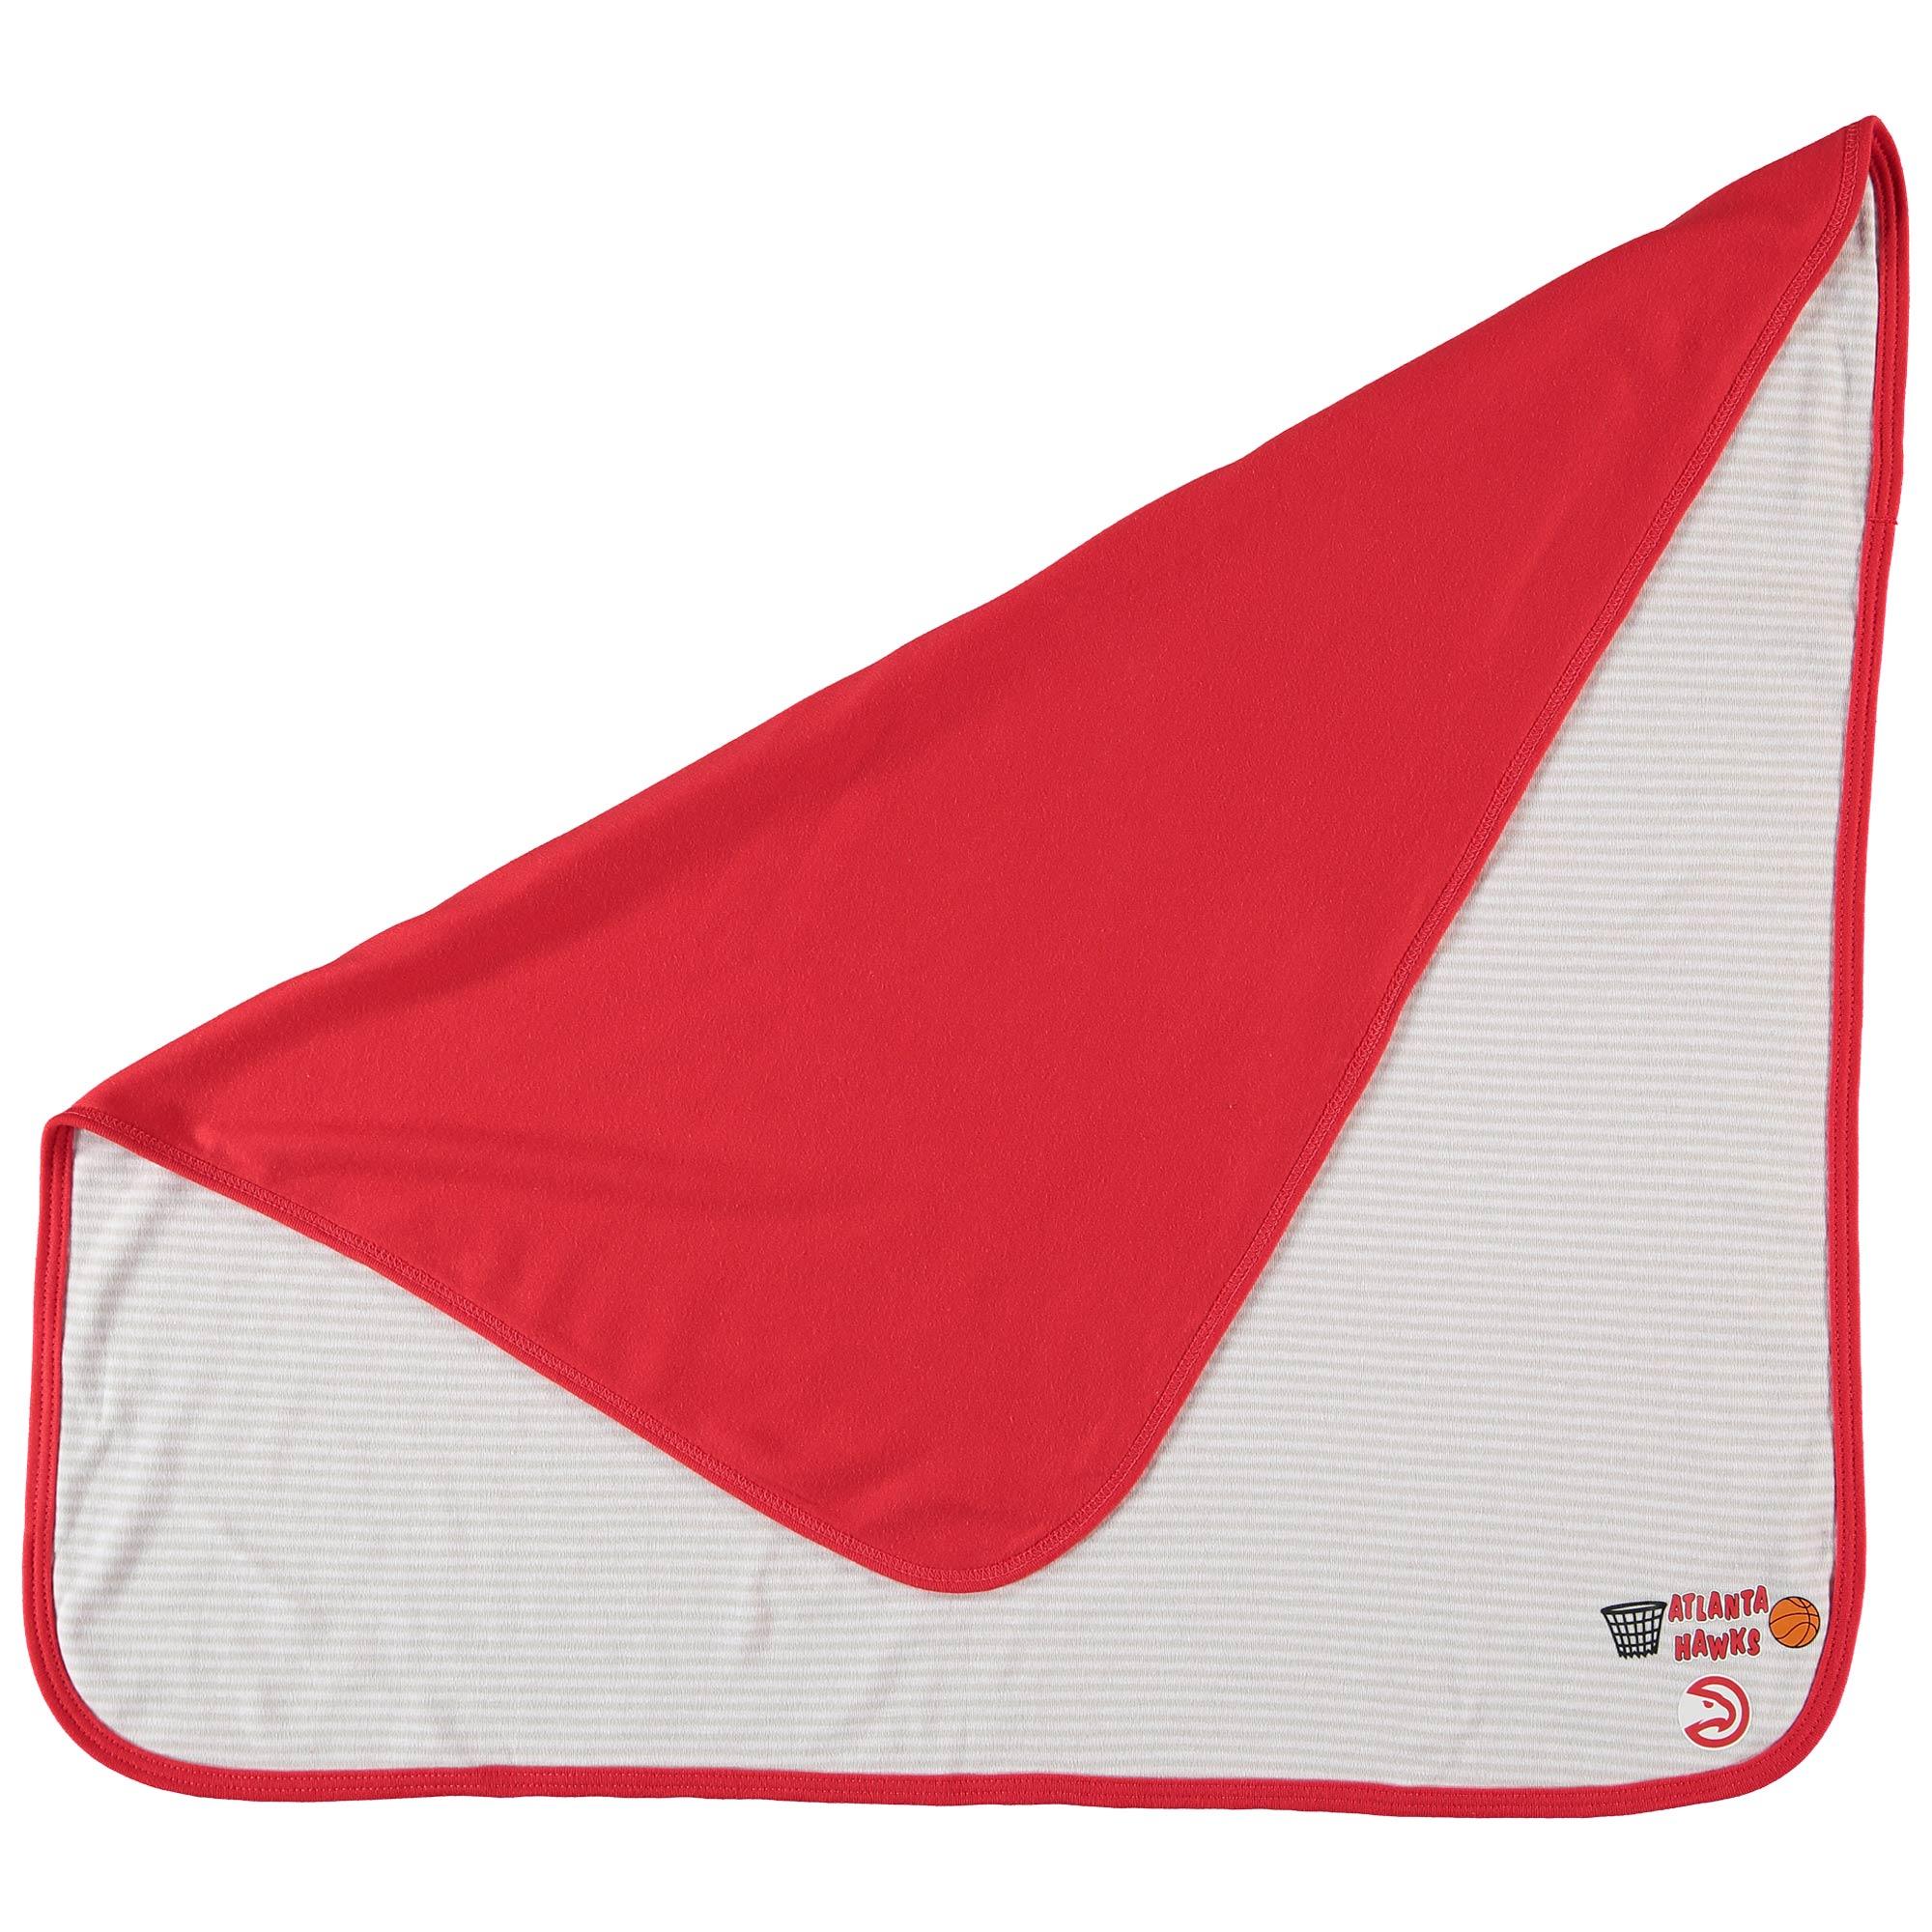 Atlanta Hawks Infant Lil Kicker Baby Blanket - Red